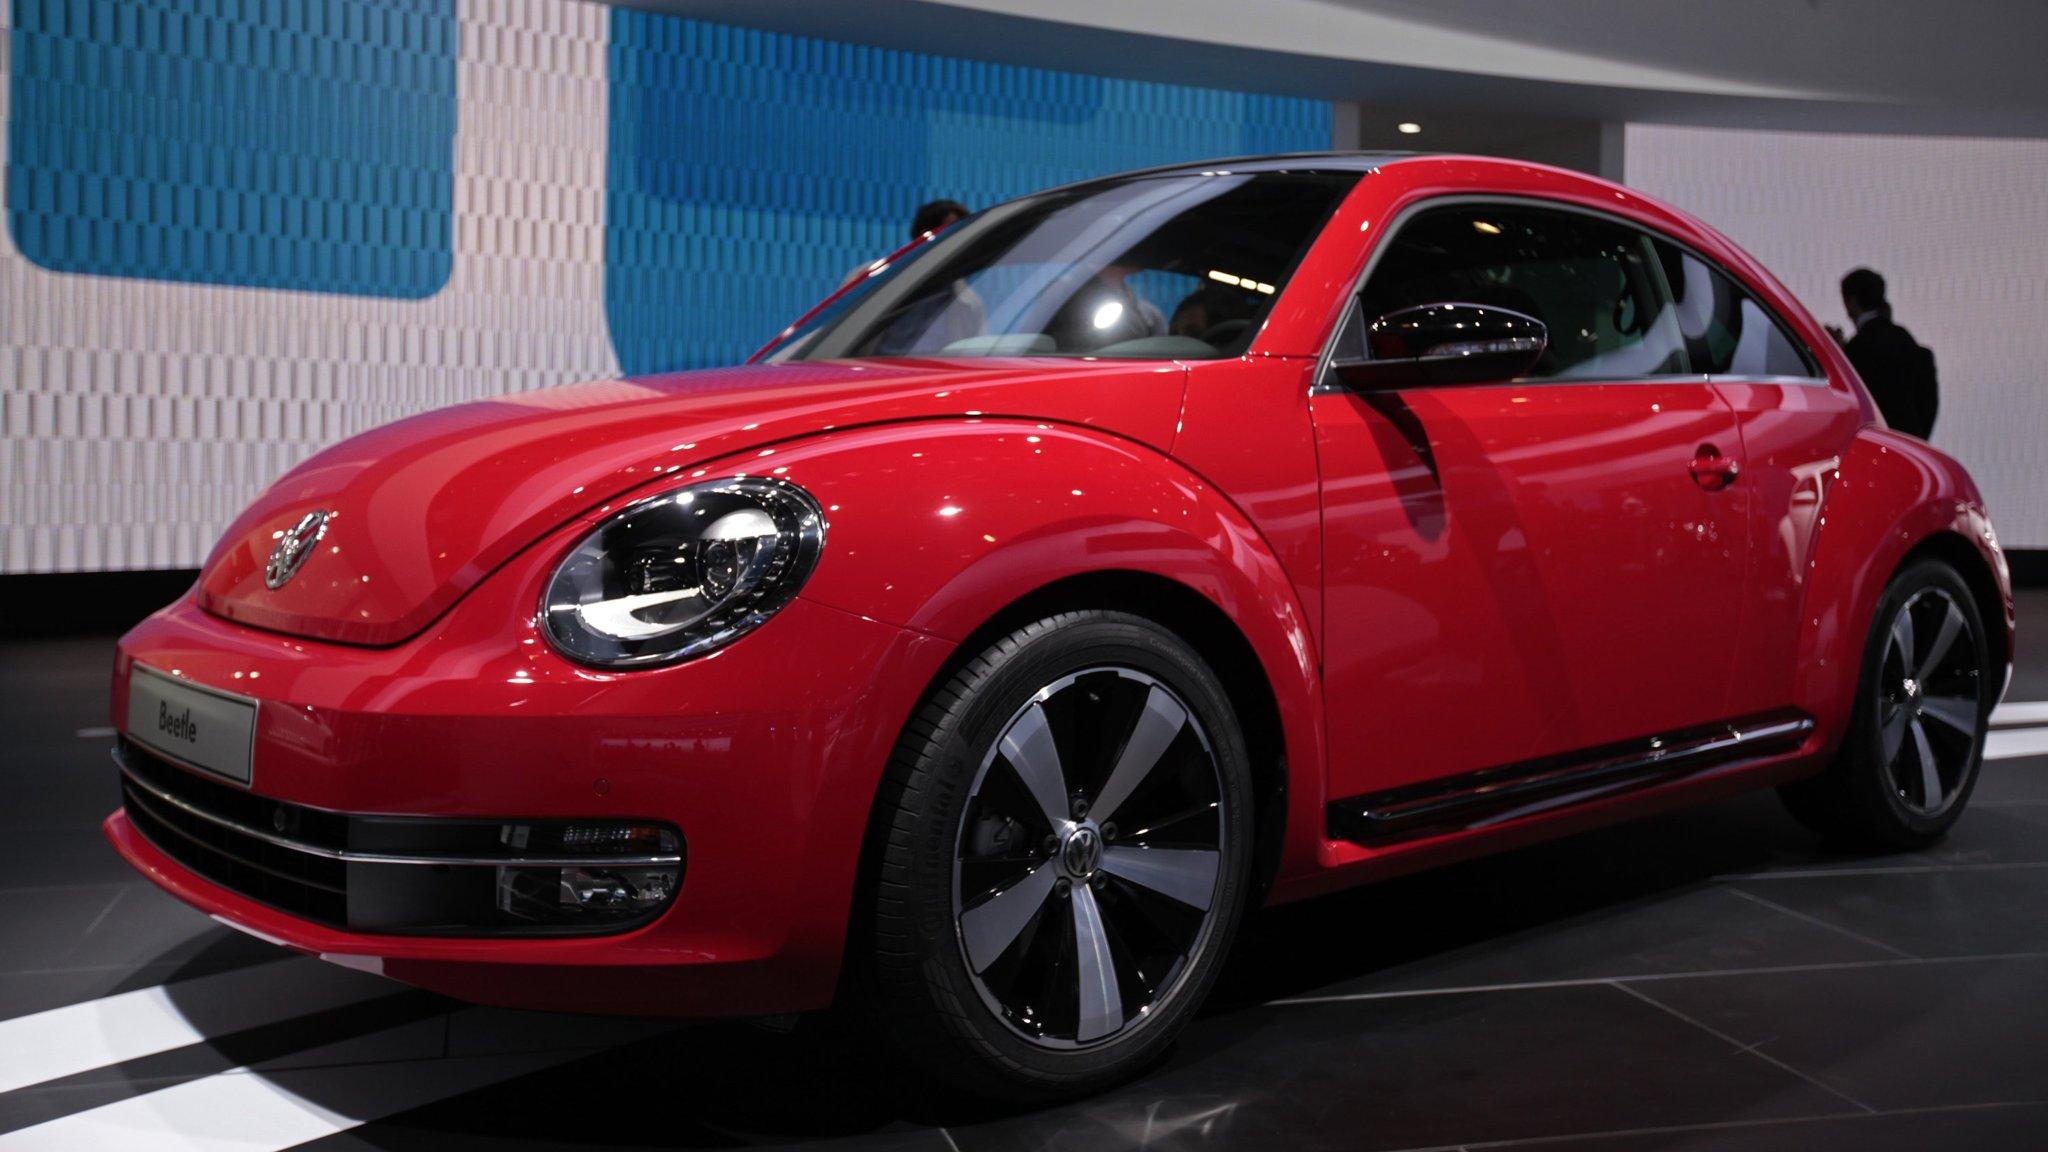 Cavie-umane-scandalo-Volkswagen